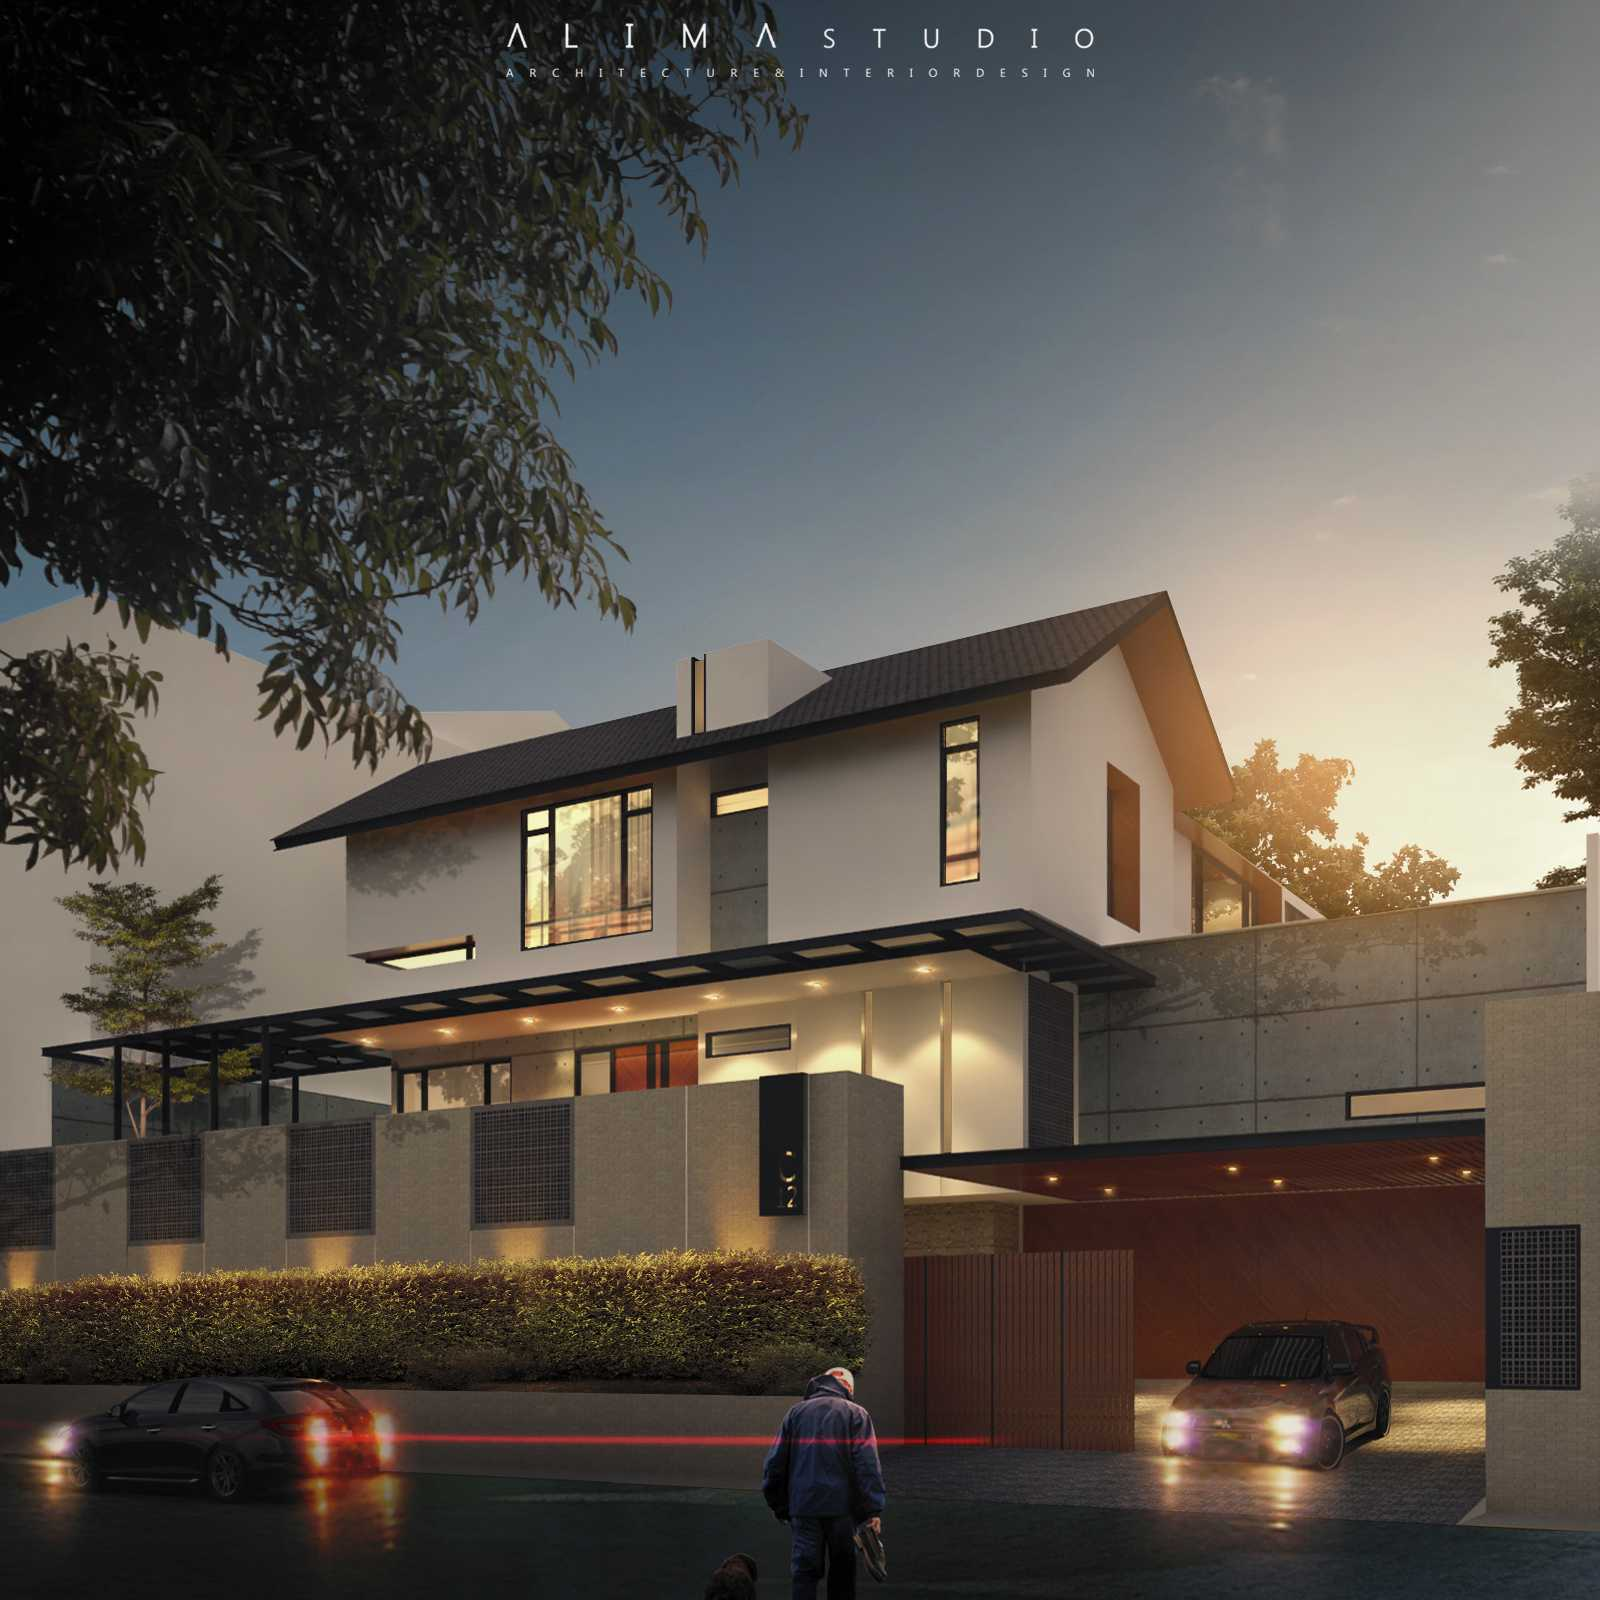 Alima Studio Sa House Makassar, Kota Makassar, Sulawesi Selatan, Indonesia Makassar, Kota Makassar, Sulawesi Selatan, Indonesia Alima-Studio-Sa-House Tropical 66570